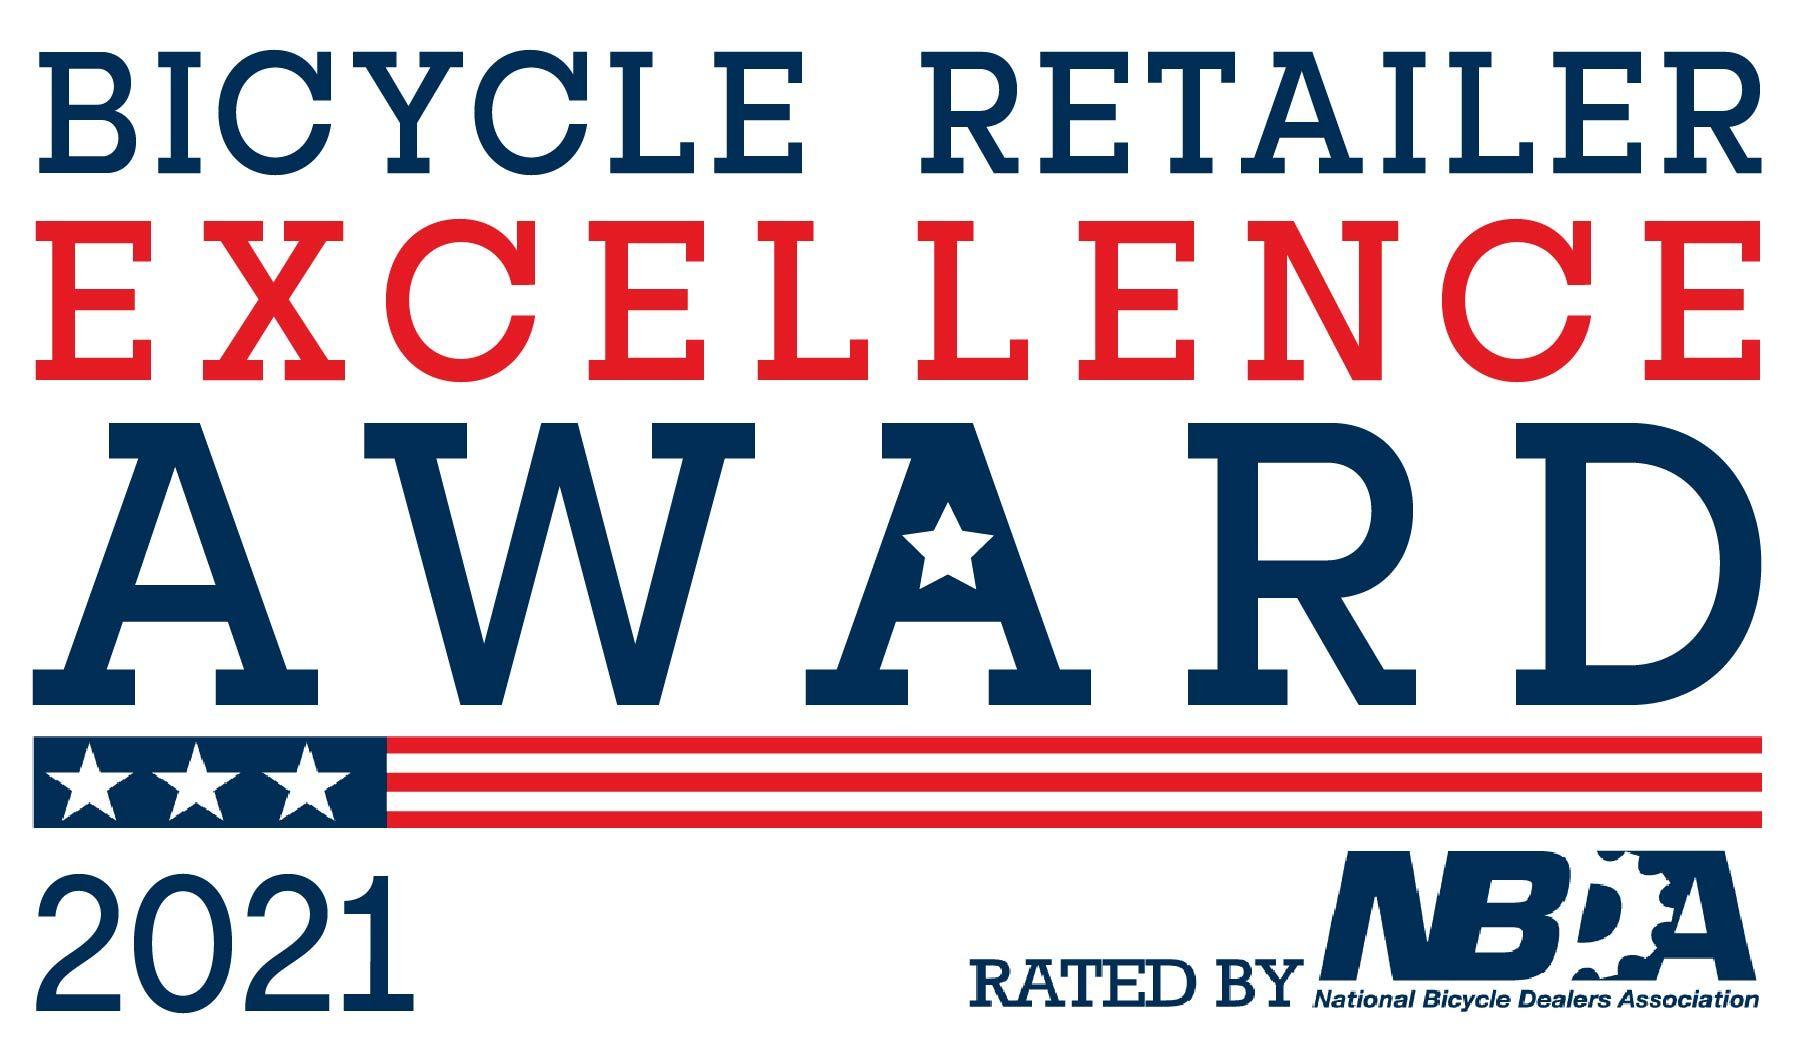 Bicycle Retailer Excellence Award 2021